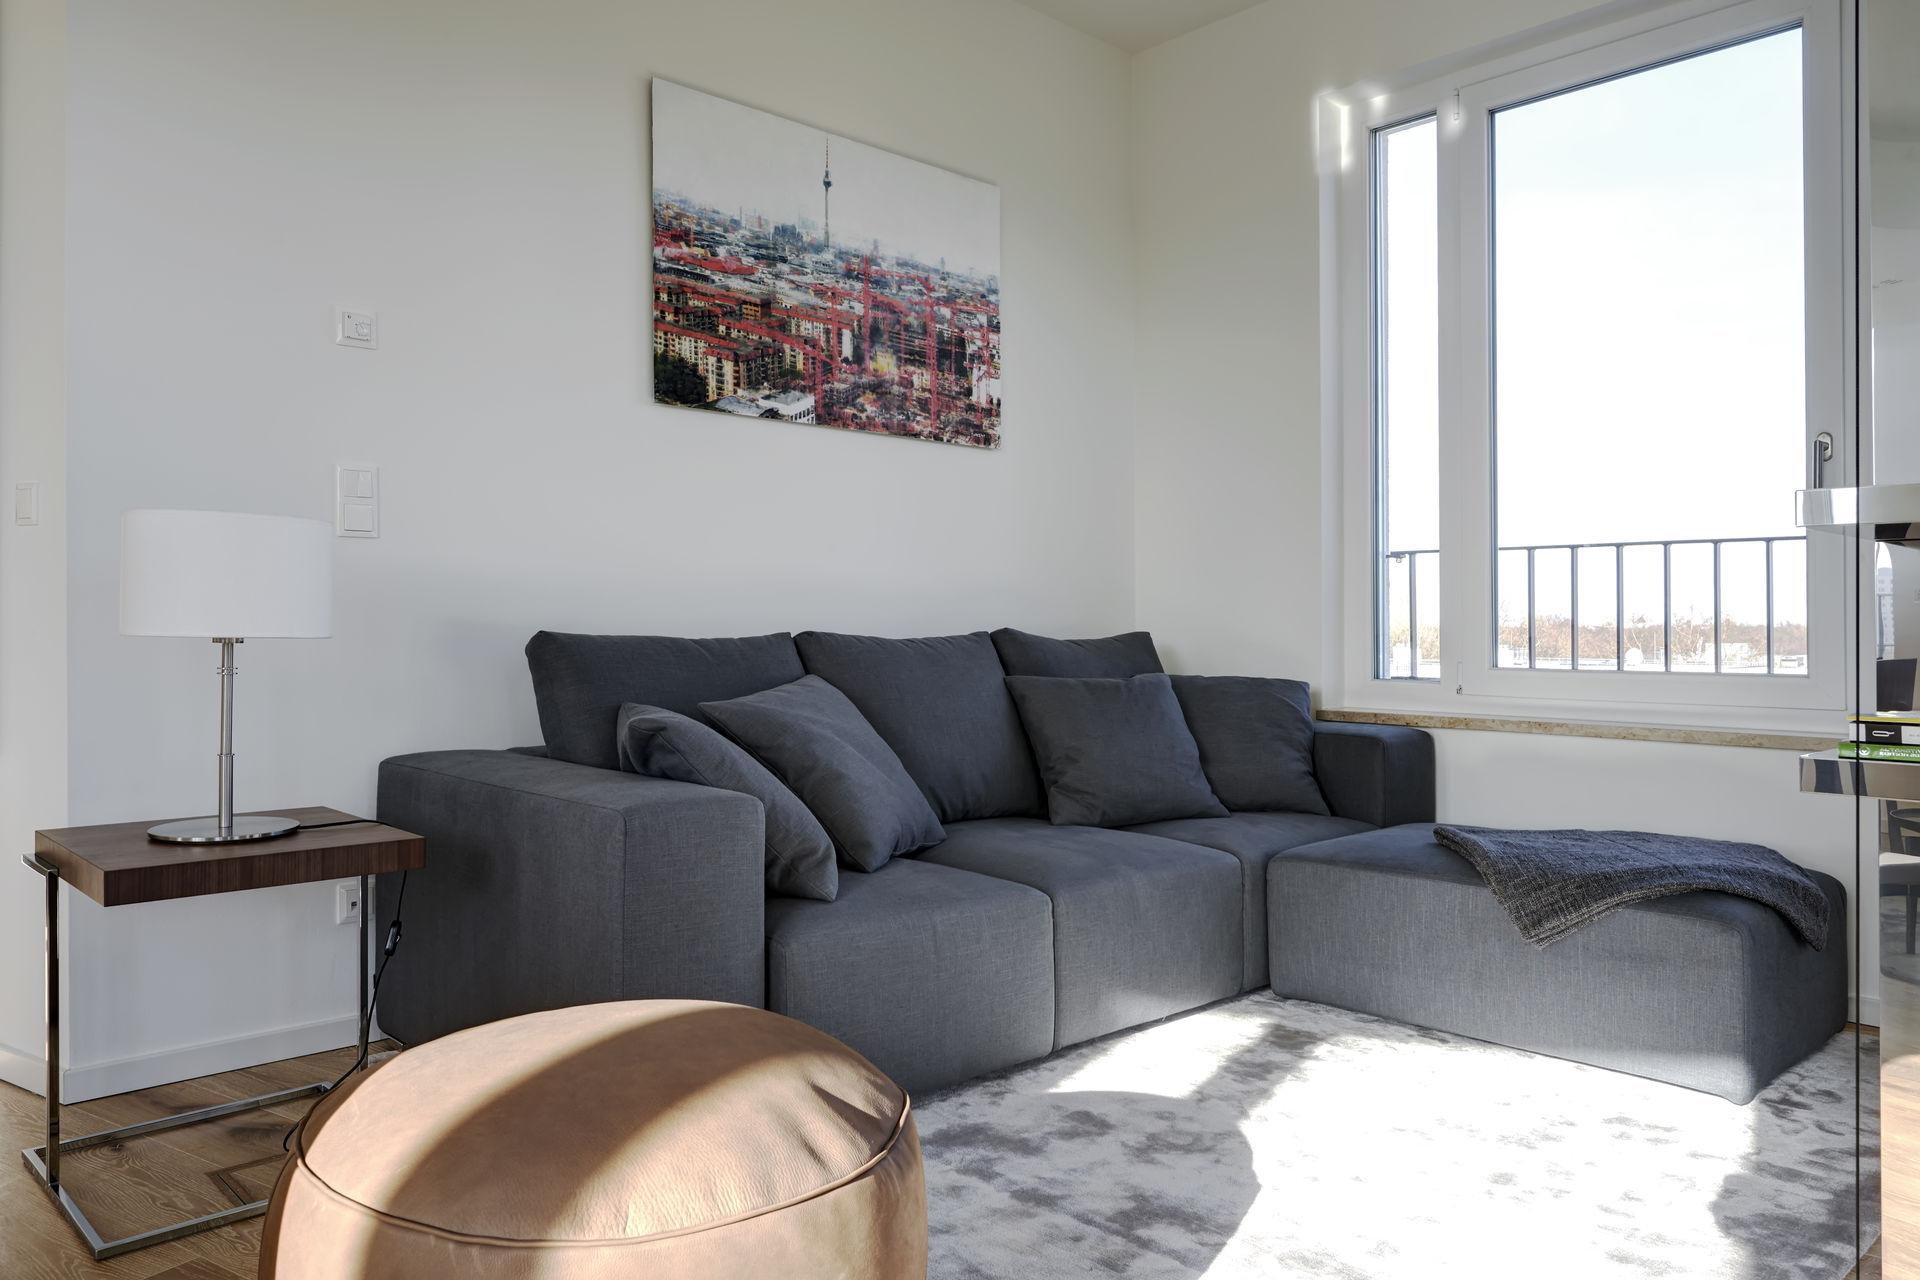 luxus penthouse im diplomaten viertel farawayhome. Black Bedroom Furniture Sets. Home Design Ideas